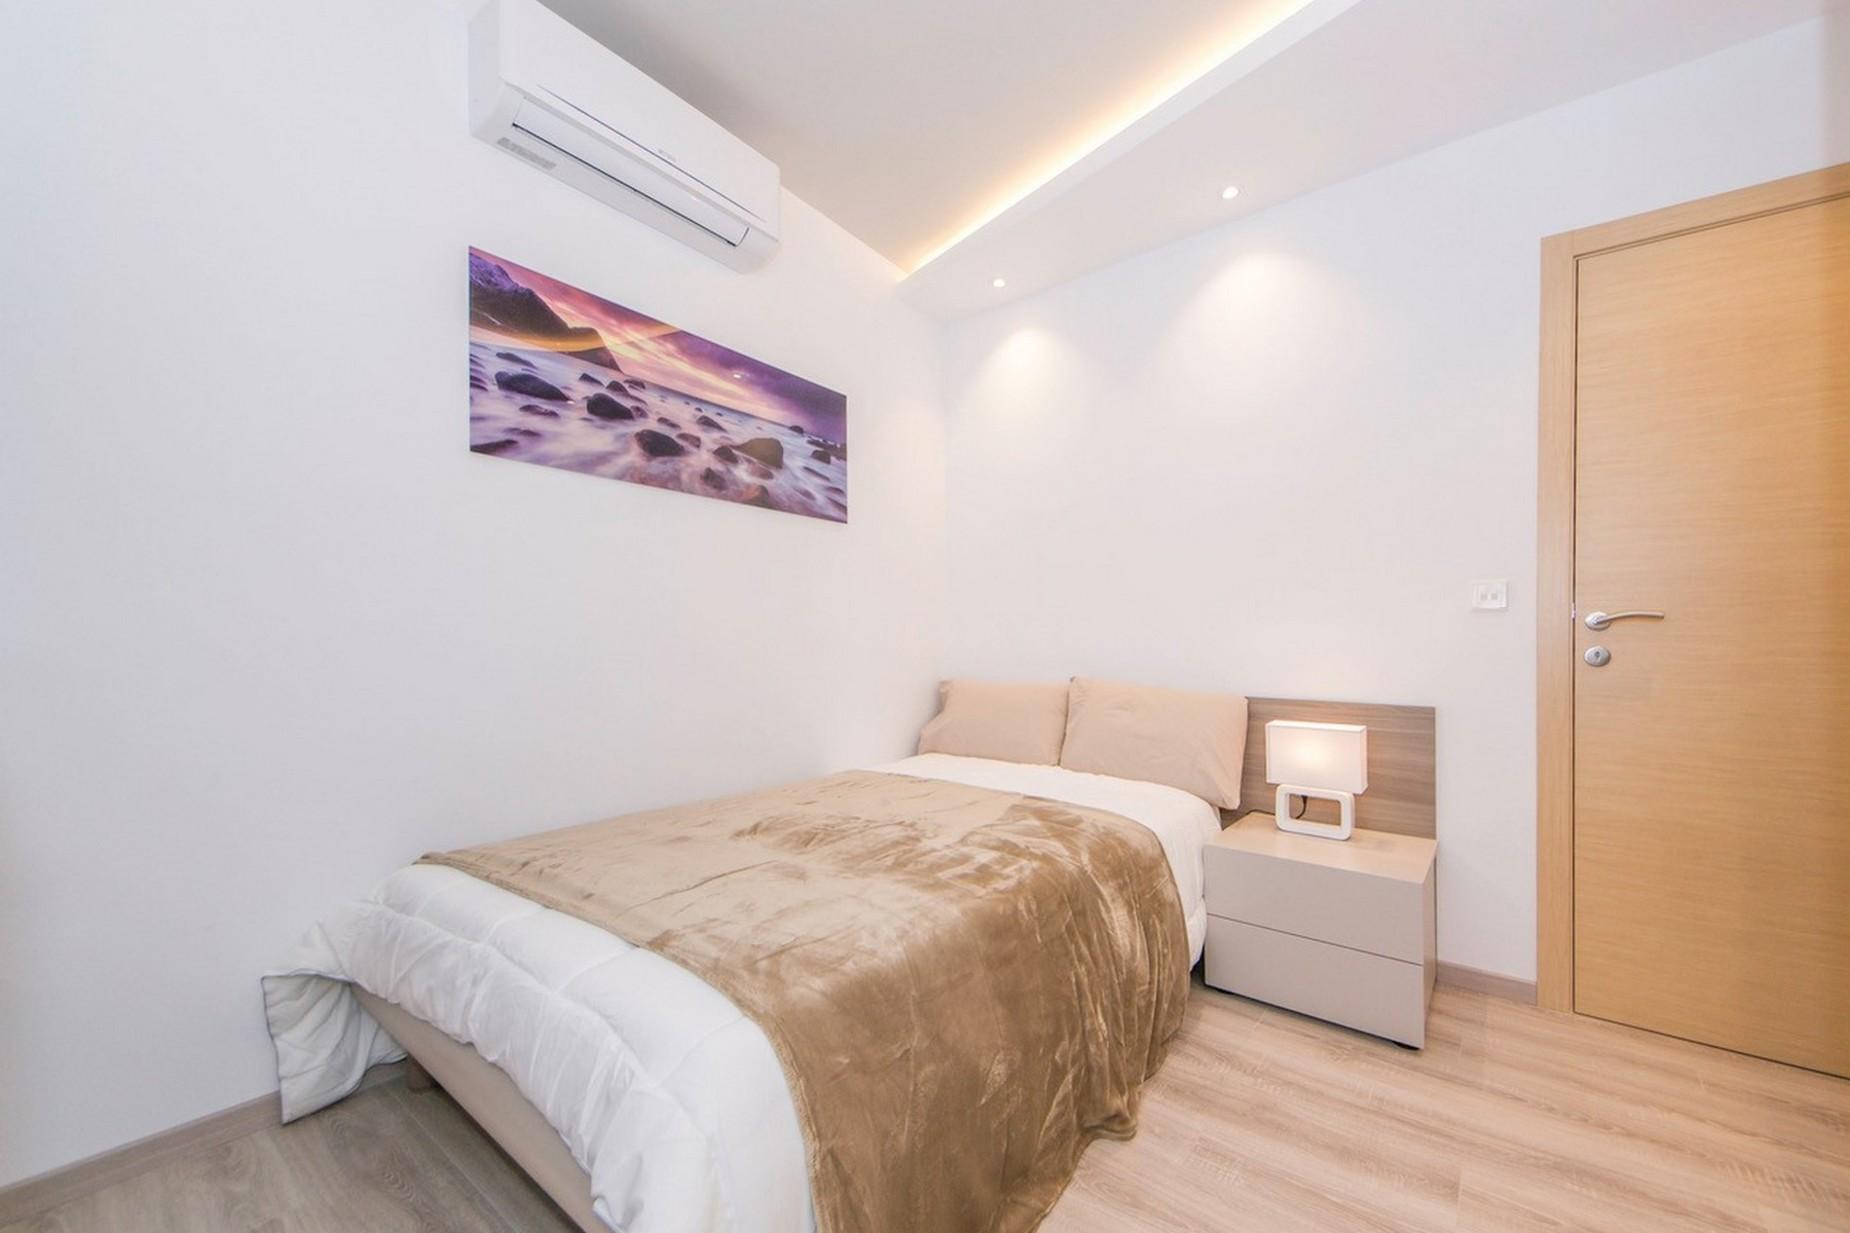 2 bed Apartment For Rent in Qawra, Qawra - thumb 10